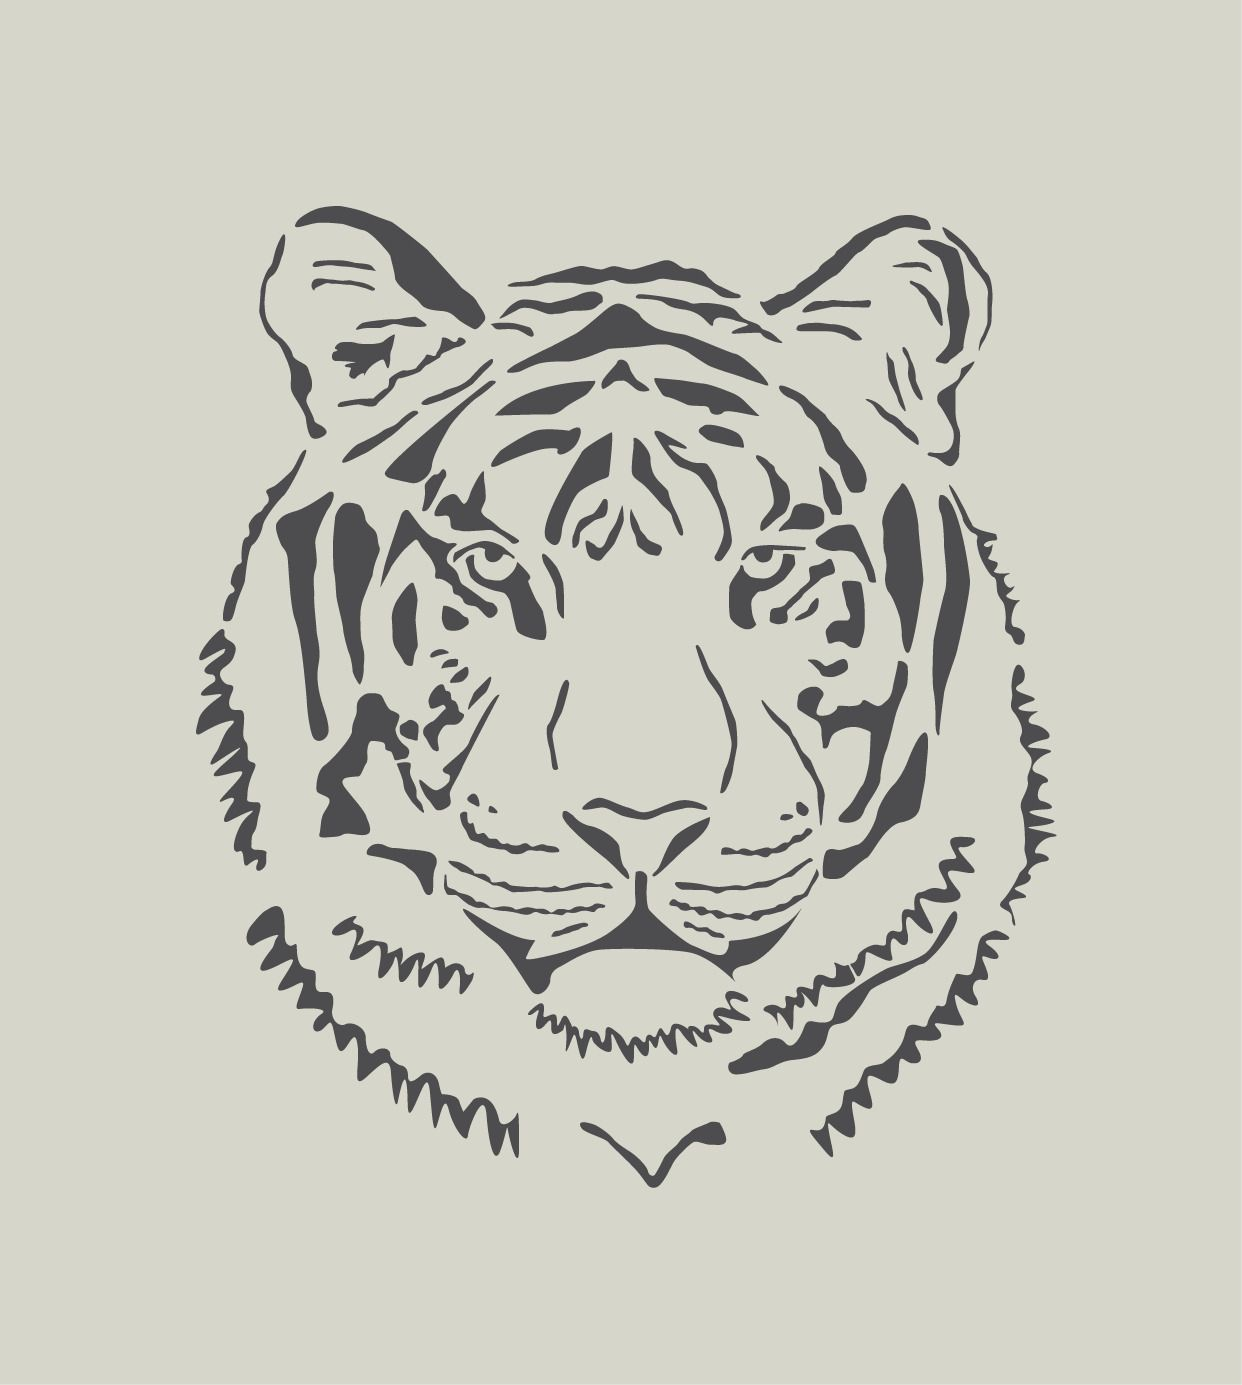 Tigre t te de tigre pochoir en vinyle adh sif ref 134 2 d coration d 39 int rieur par - Photo de tigre a imprimer ...